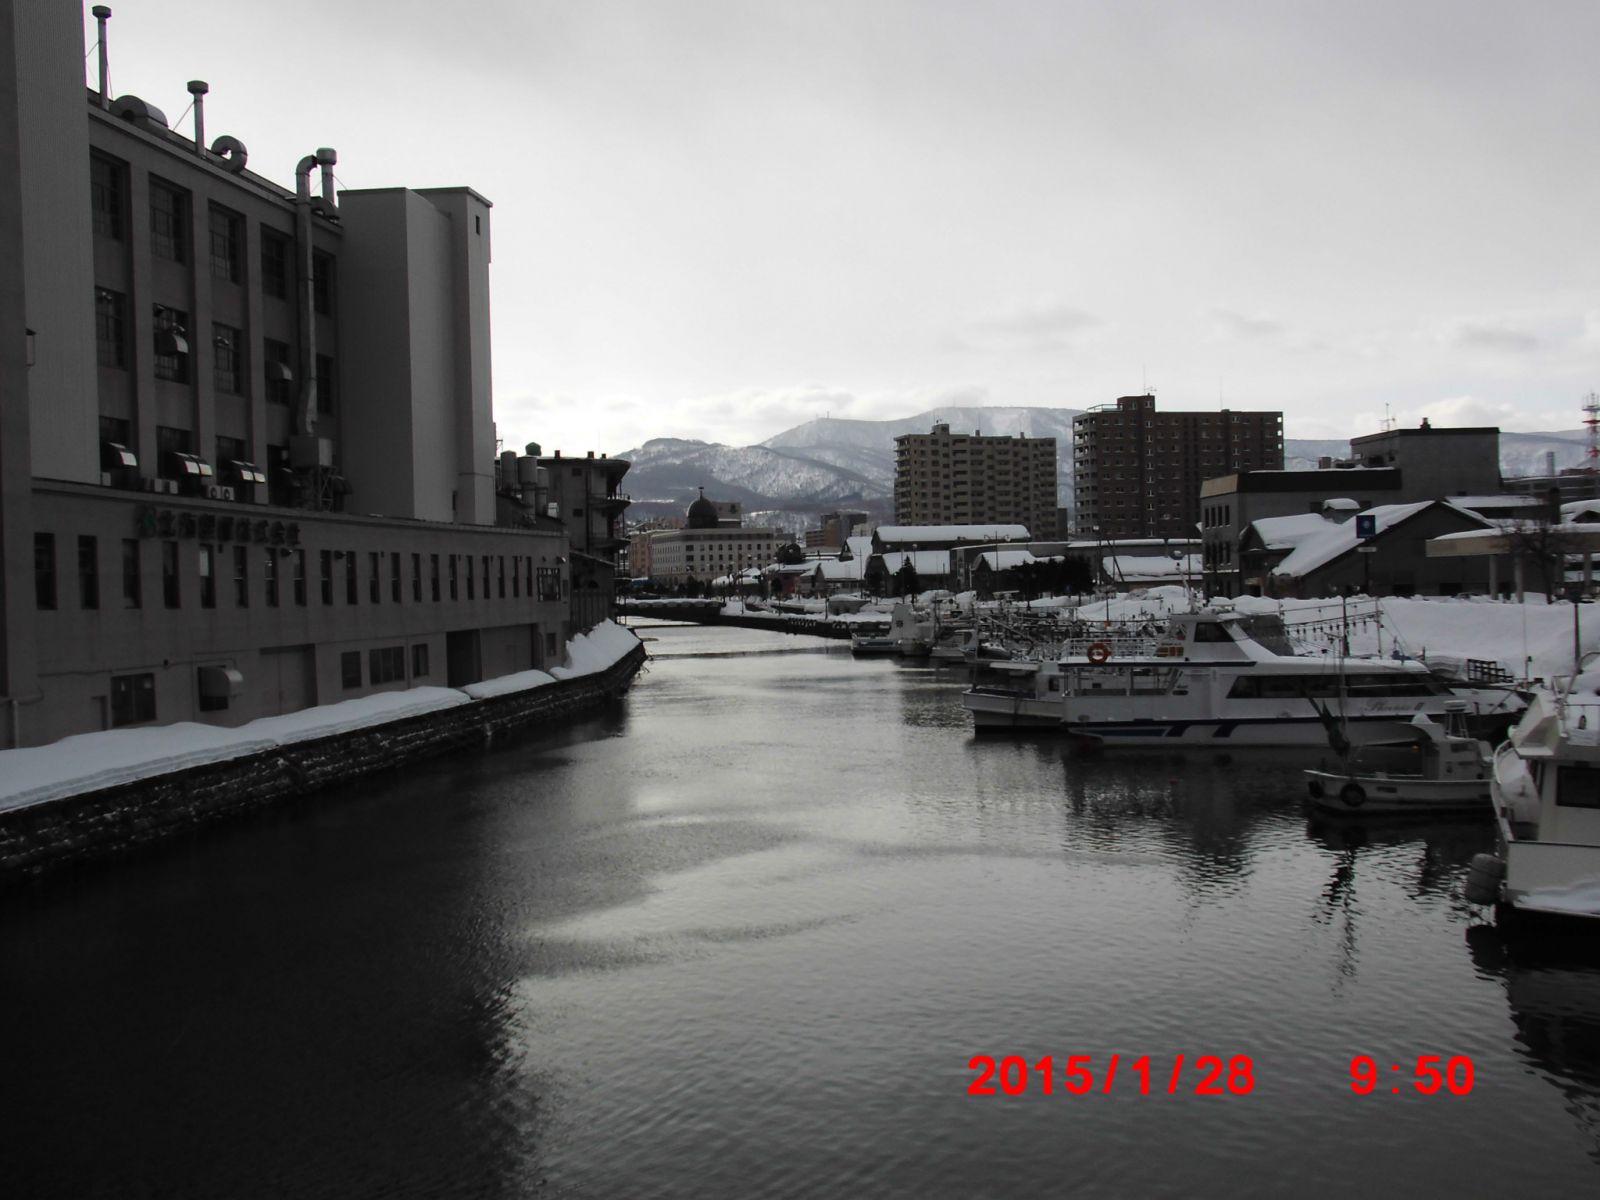 Bコース:お得な小樽市内周遊観光タクシー早回り3時間